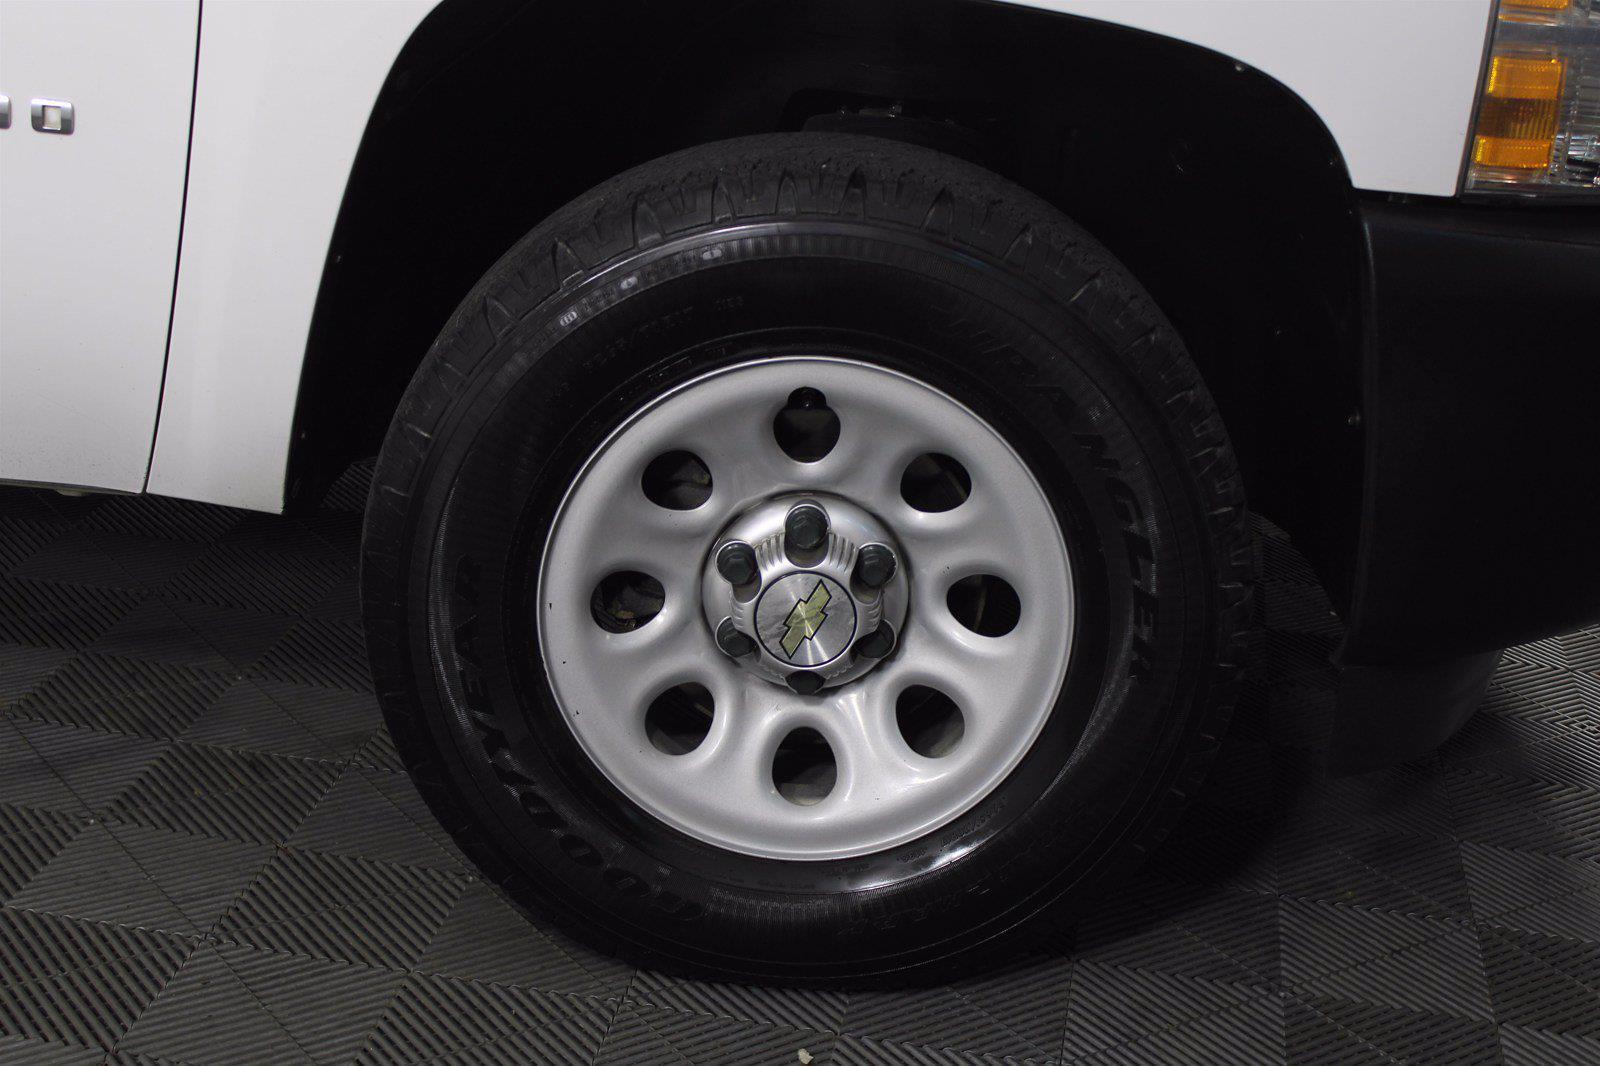 2012 Silverado 1500 Regular Cab 4x4,  Pickup #D120034A - photo 5